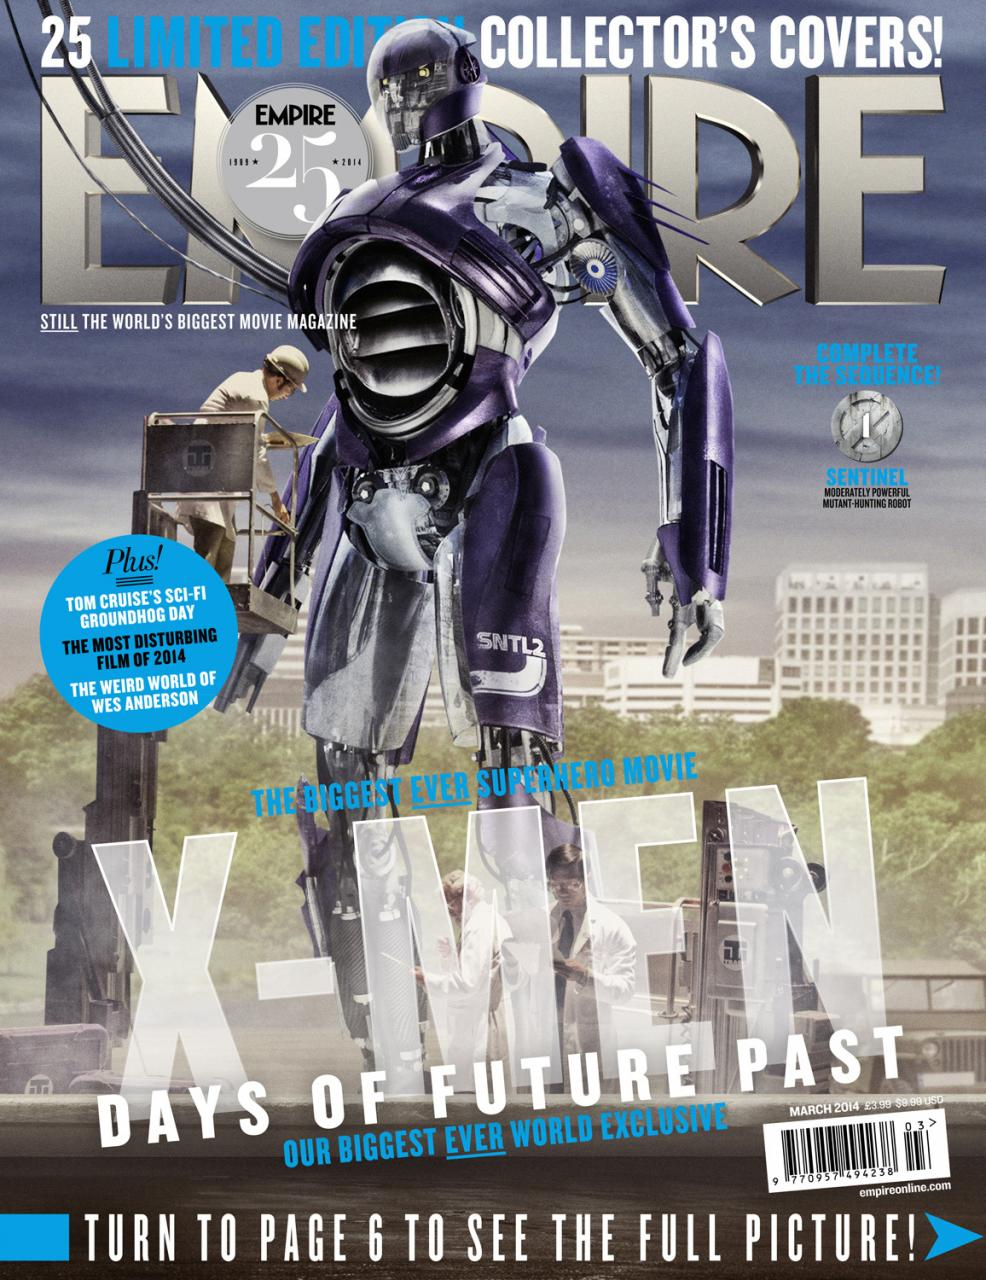 X-MEN DAYS OF FUTURE PAST Empire Magazine Covers  (7)